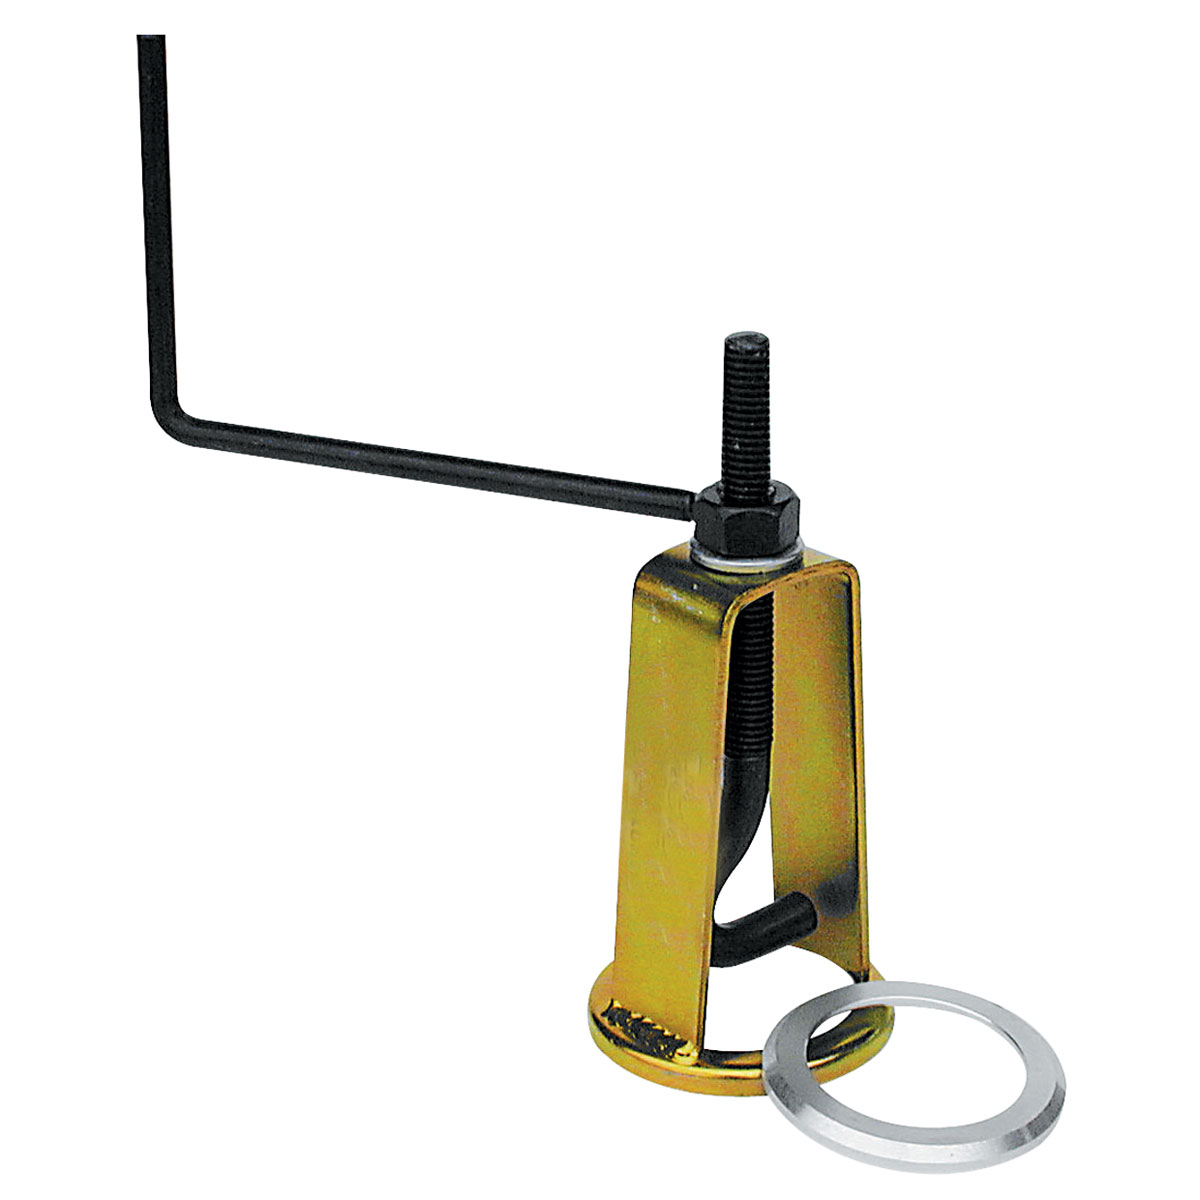 Progressive Suspension Shock Spring Tool